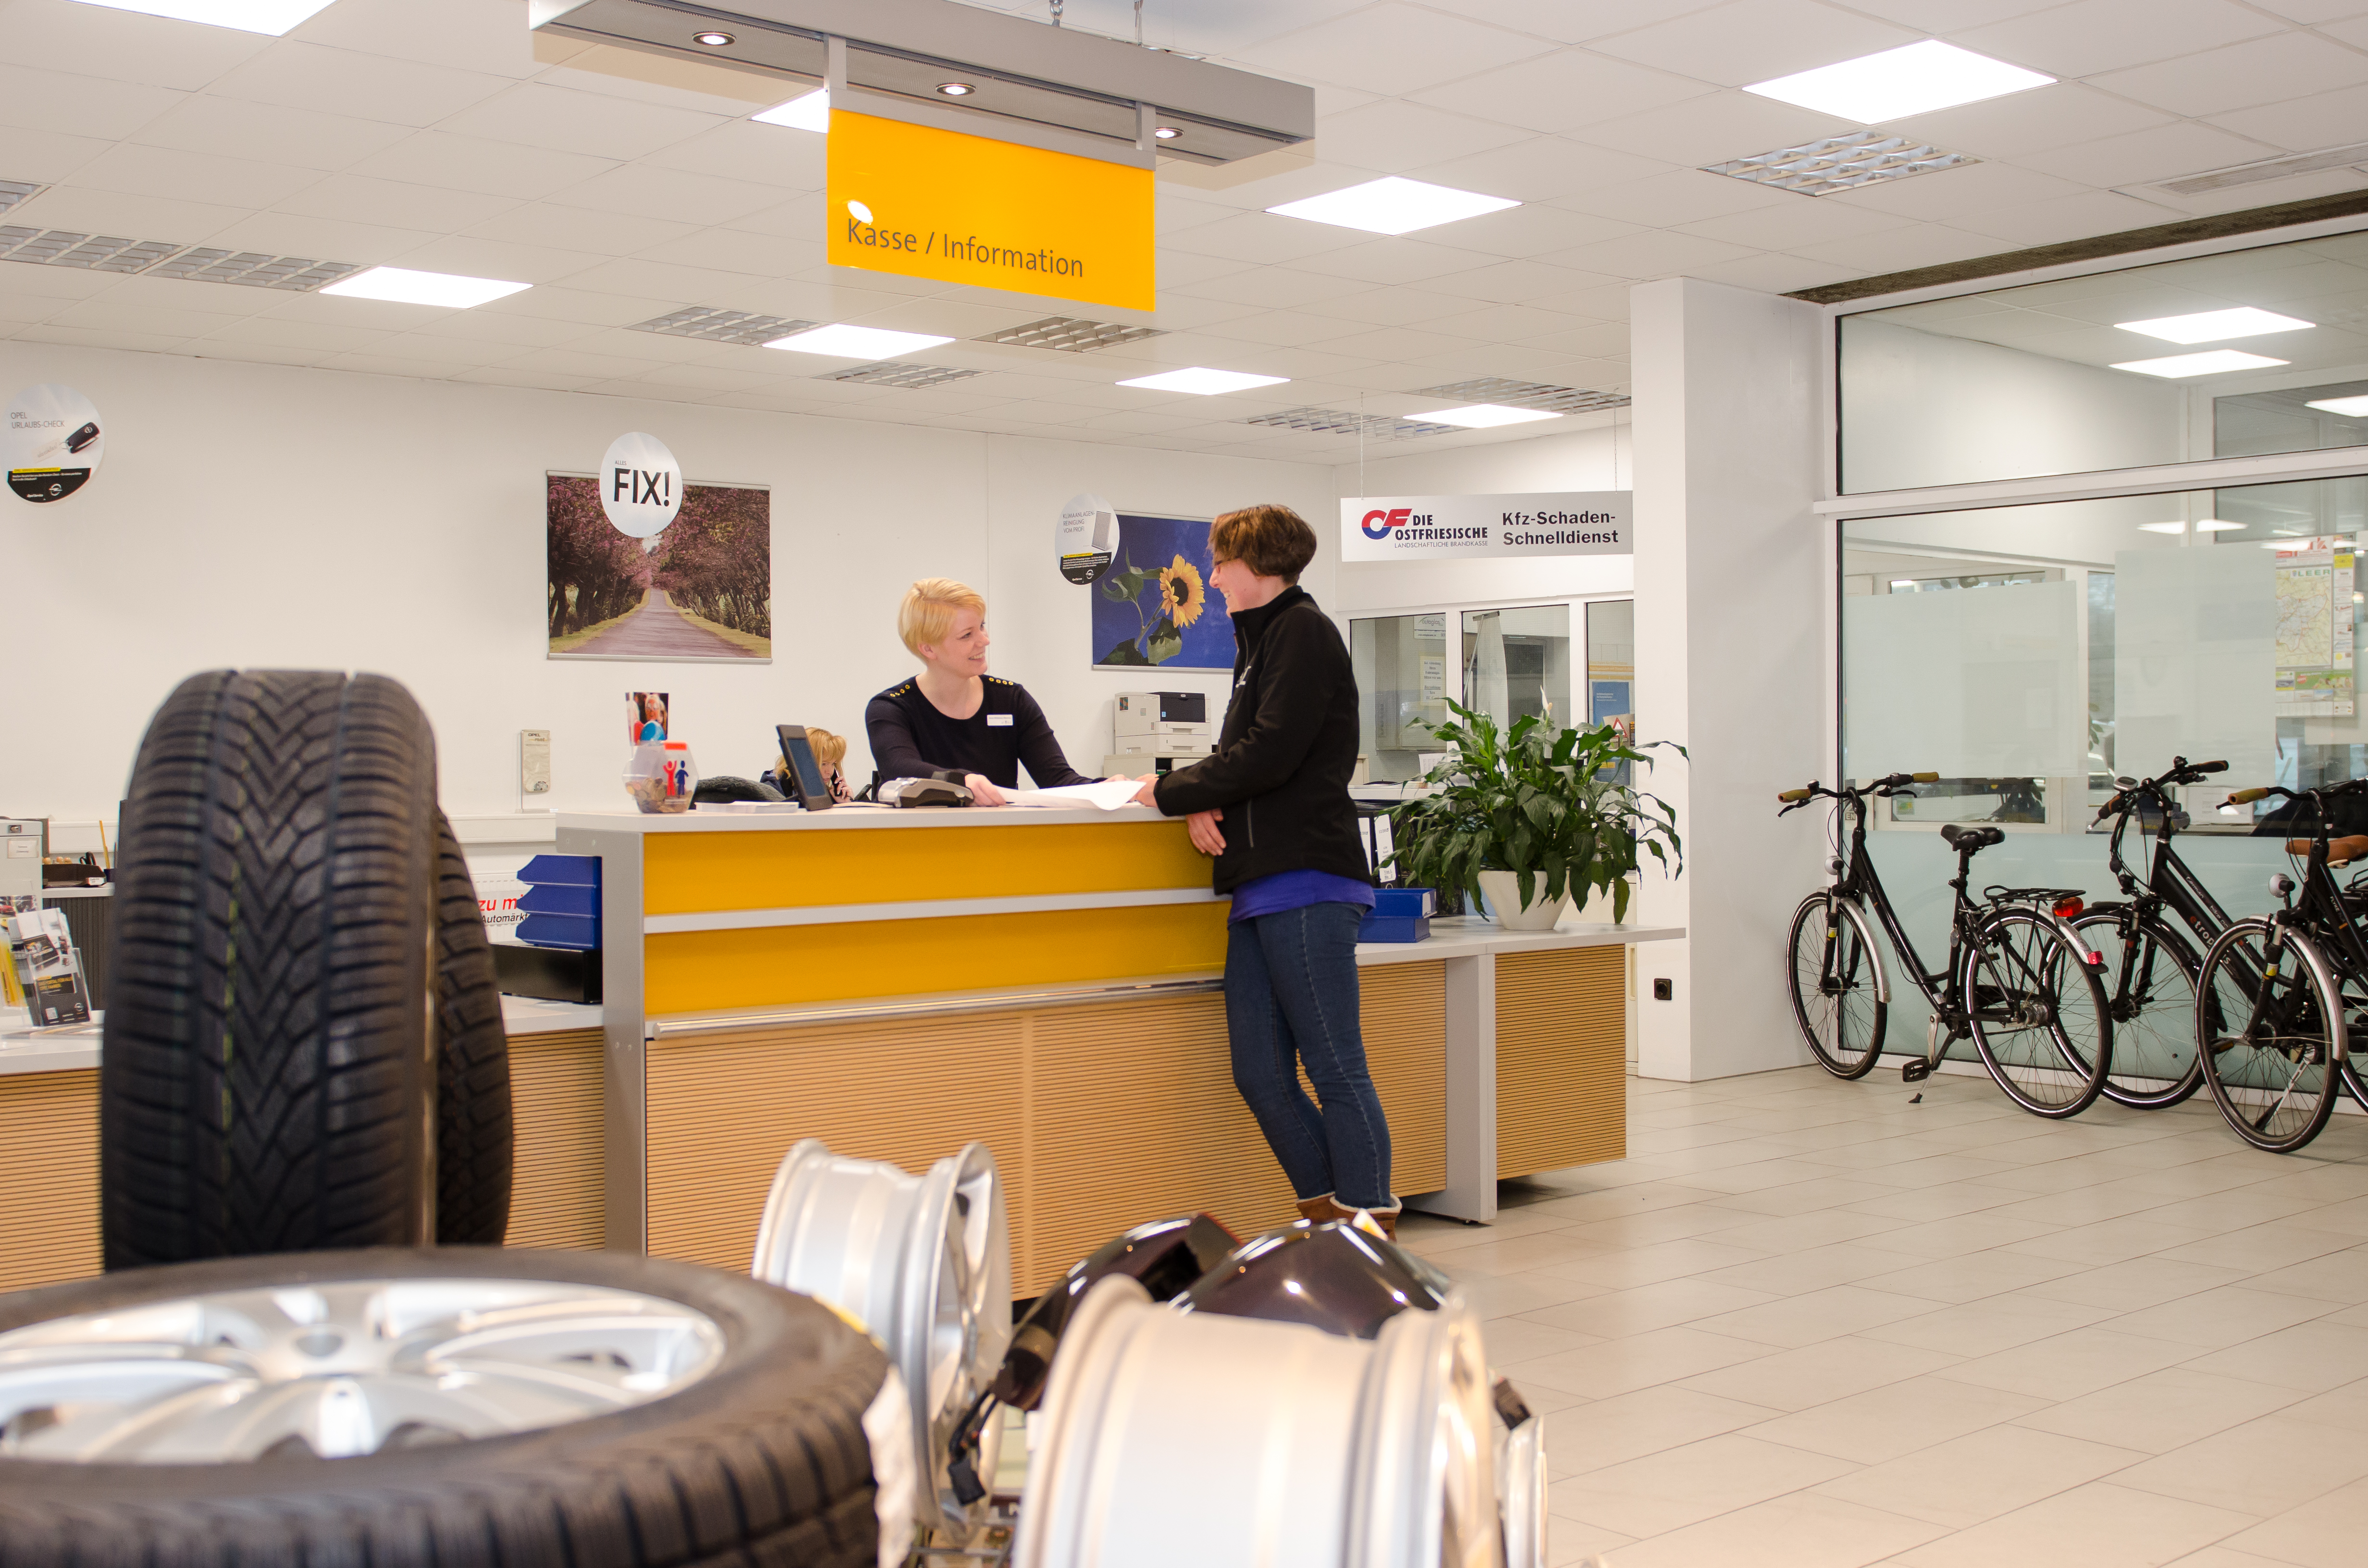 DSC_0638.jpg – HIRO Automarkt GmbH